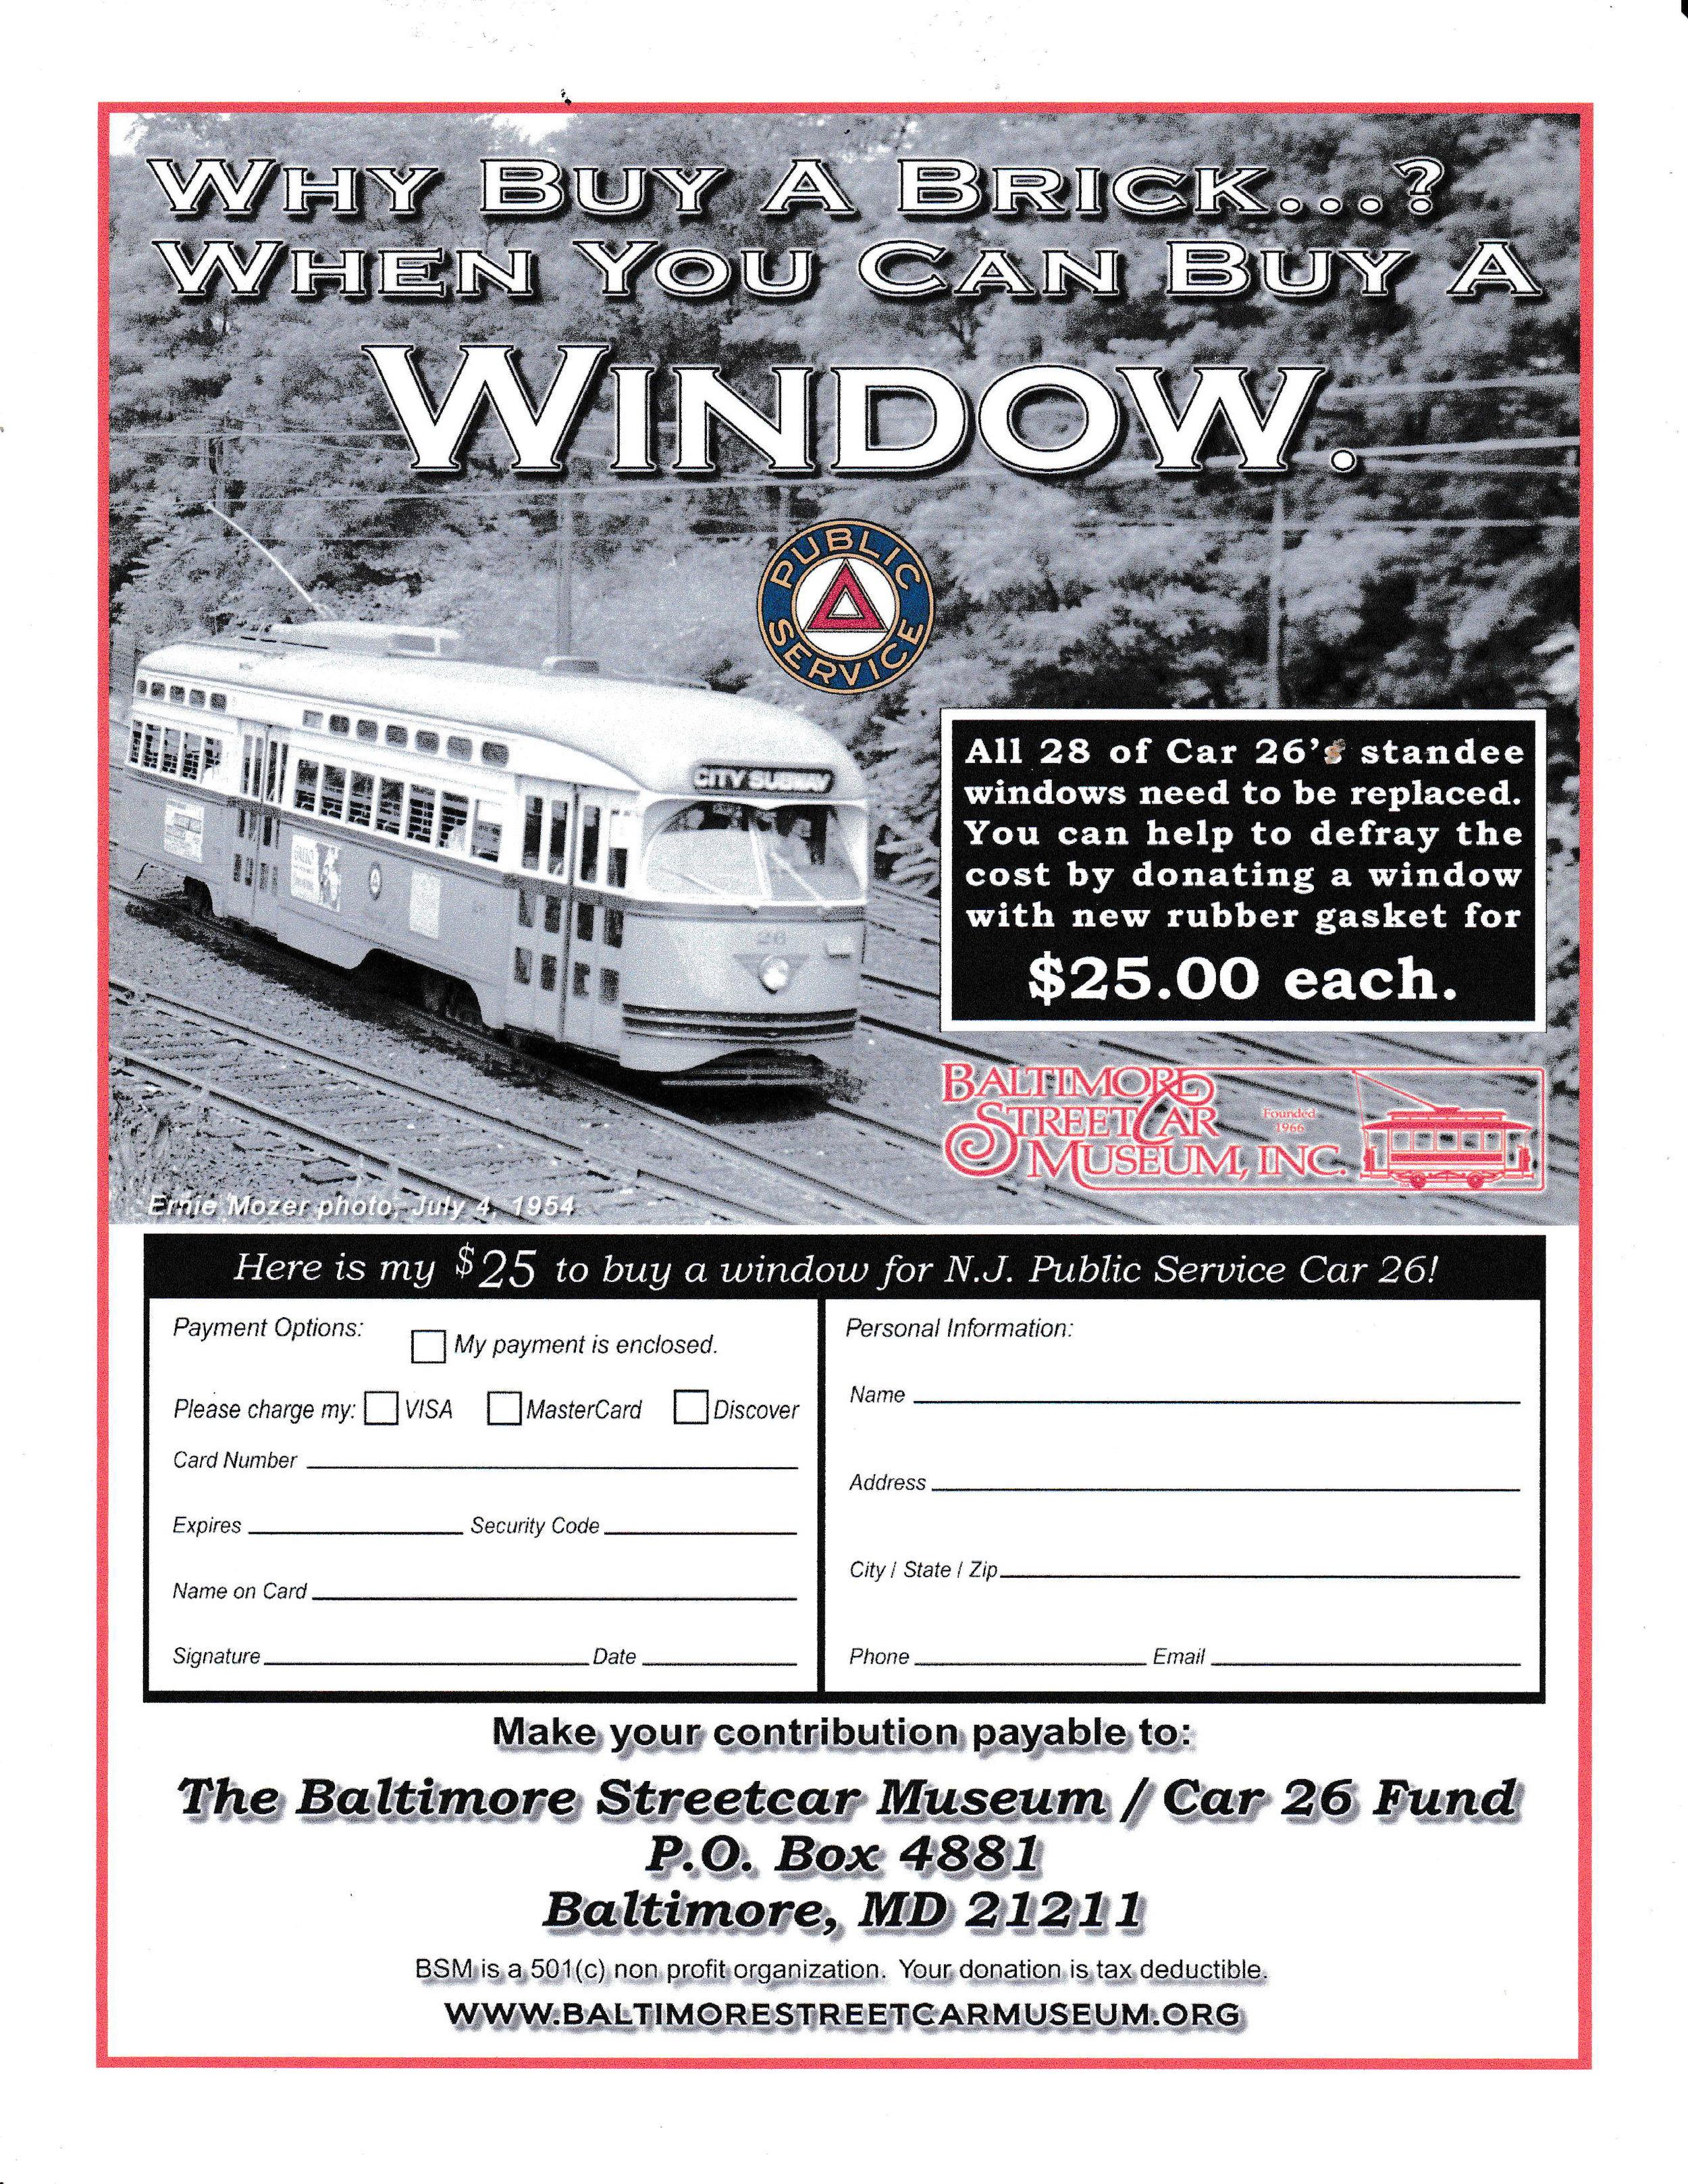 STANDEE WINDOW APPEAL FOR NEW JERSEY TRANSIT PCC #26.jpg